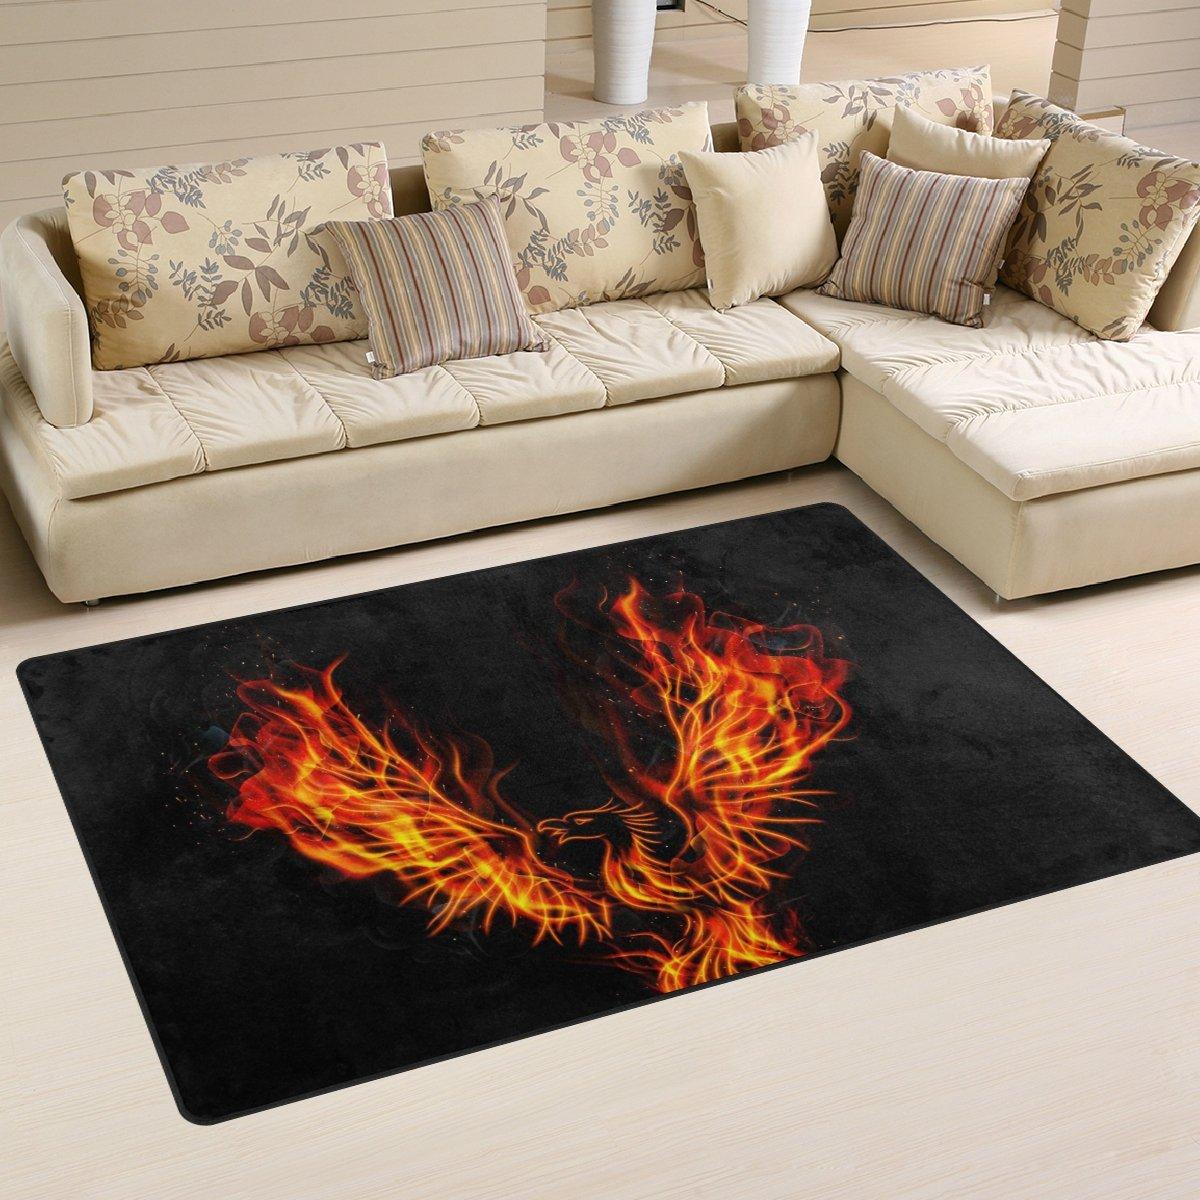 Amazon.com: ingbags Super Suave Moderna zona Phoenix salón ...